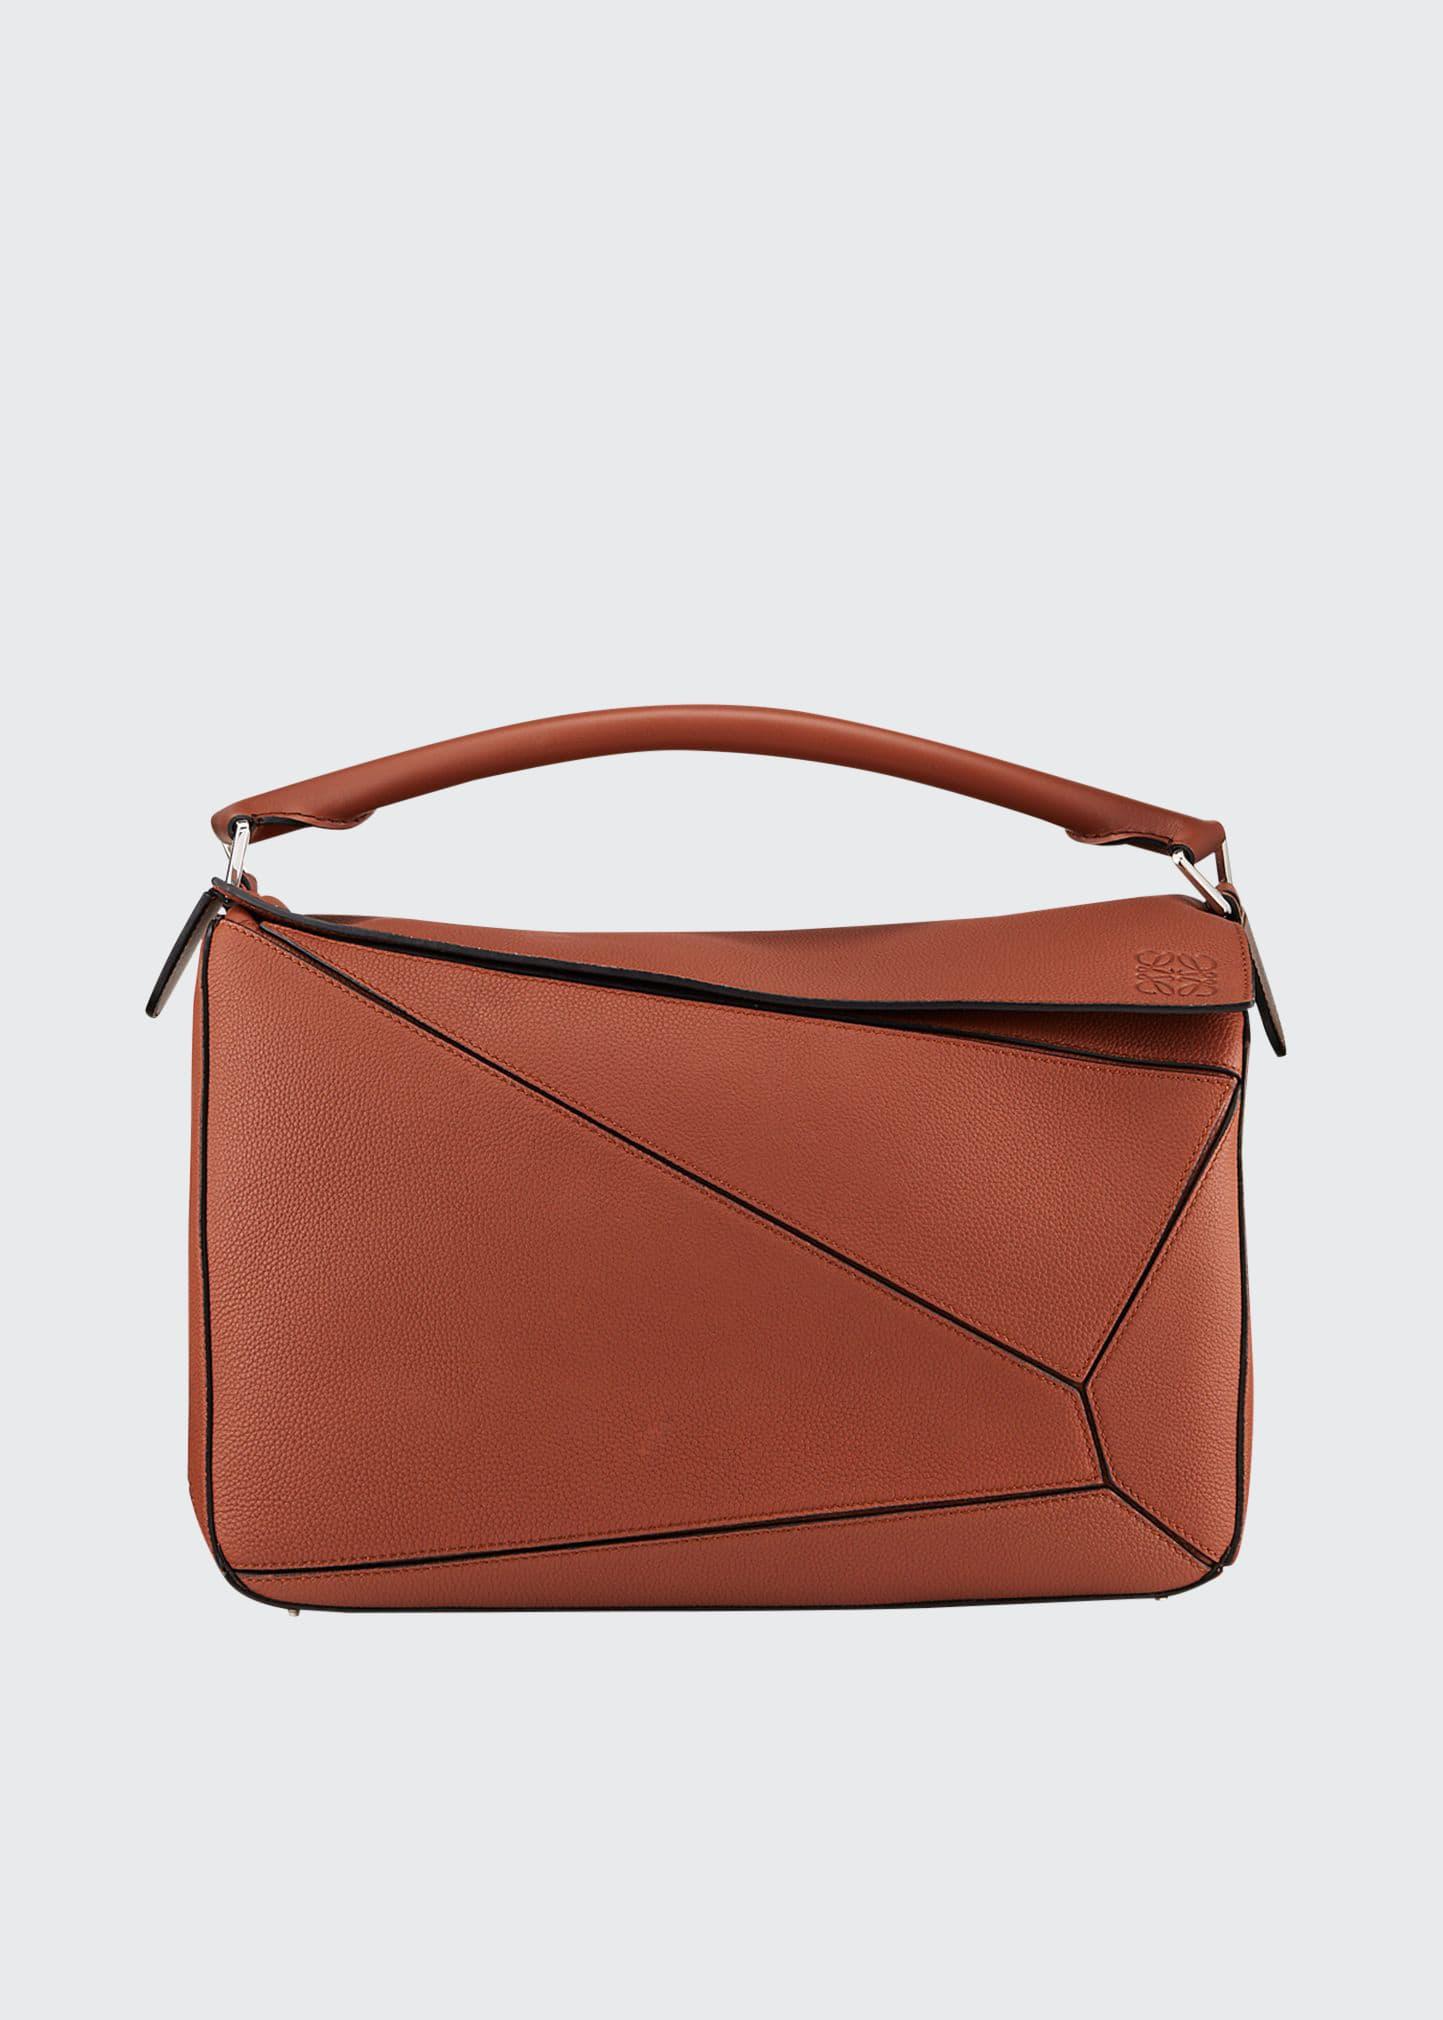 Loewe Men's Puzzle Leather Crossbody/shoulder Bag In Brown